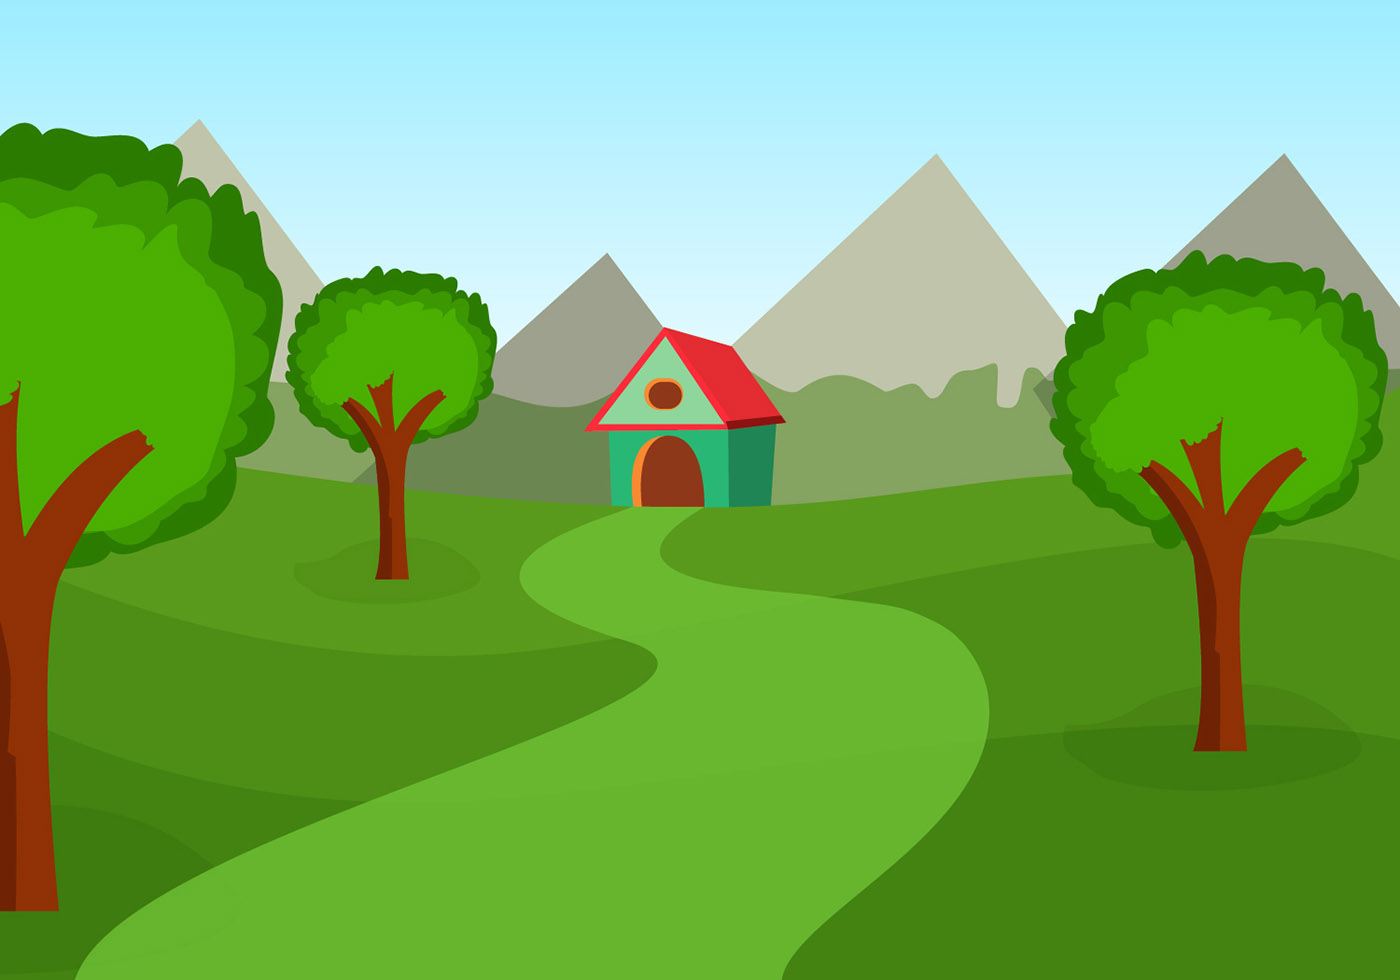 Landscape Illustration Vector Free: Download Free Vectors, Clipart